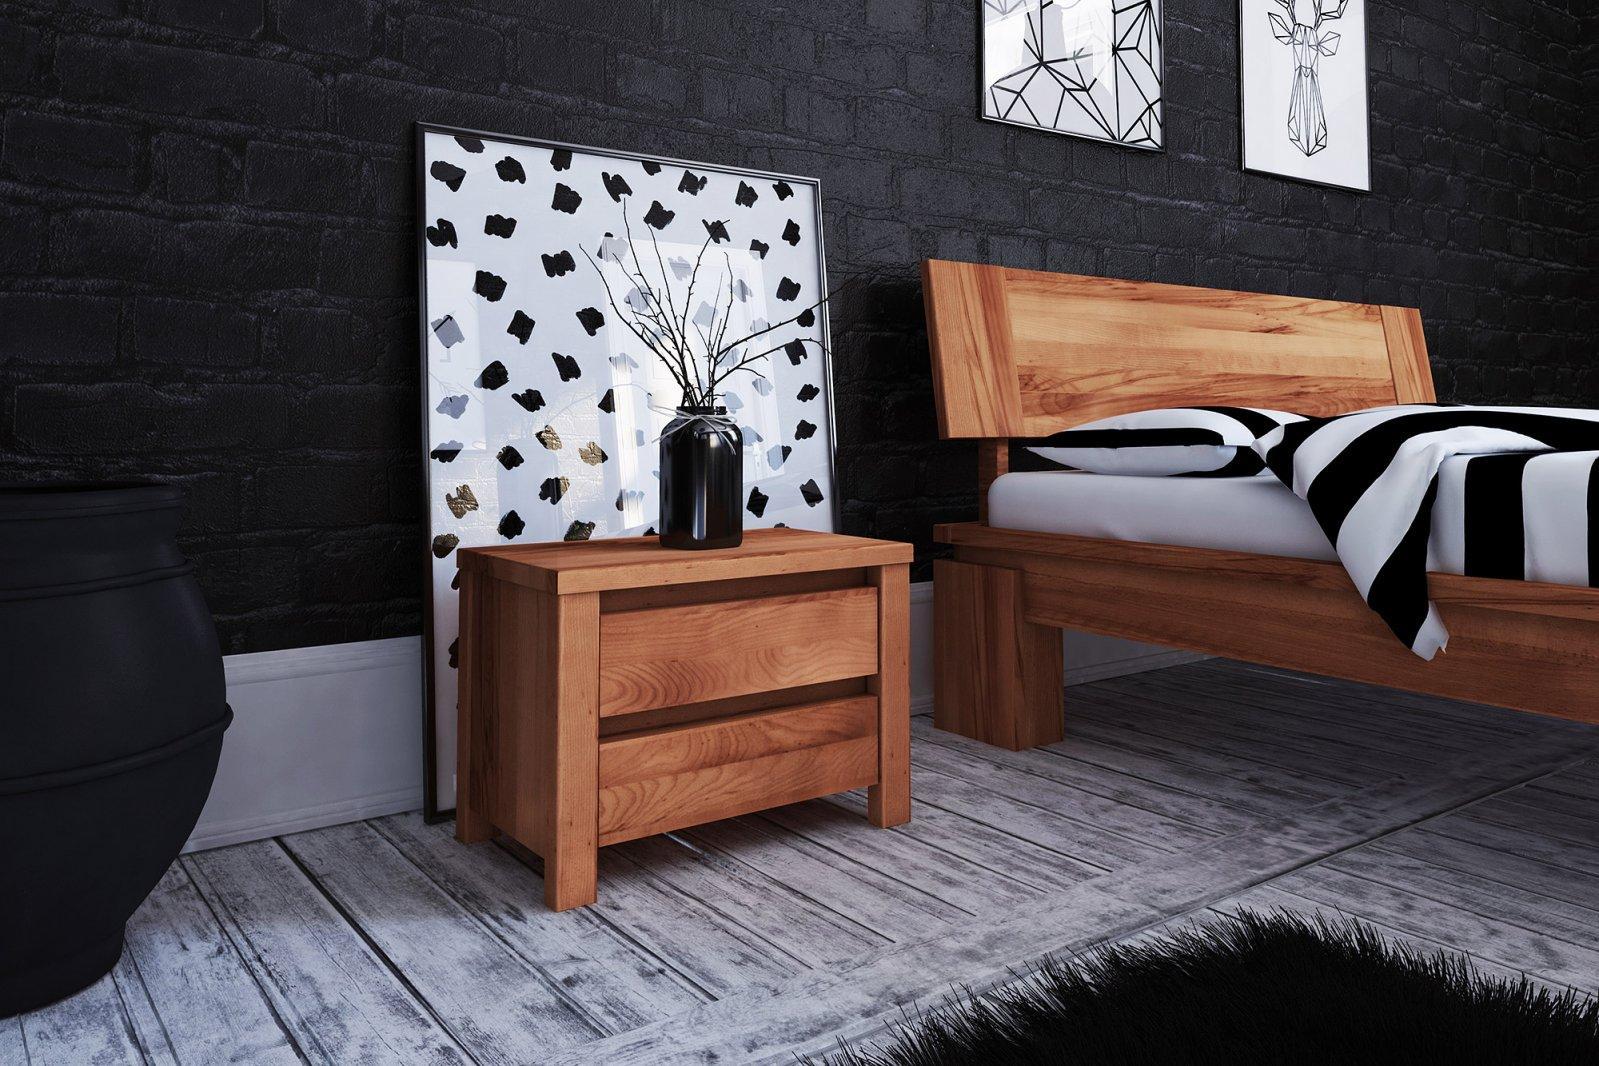 Szafka nocna VINCI z litego drewna